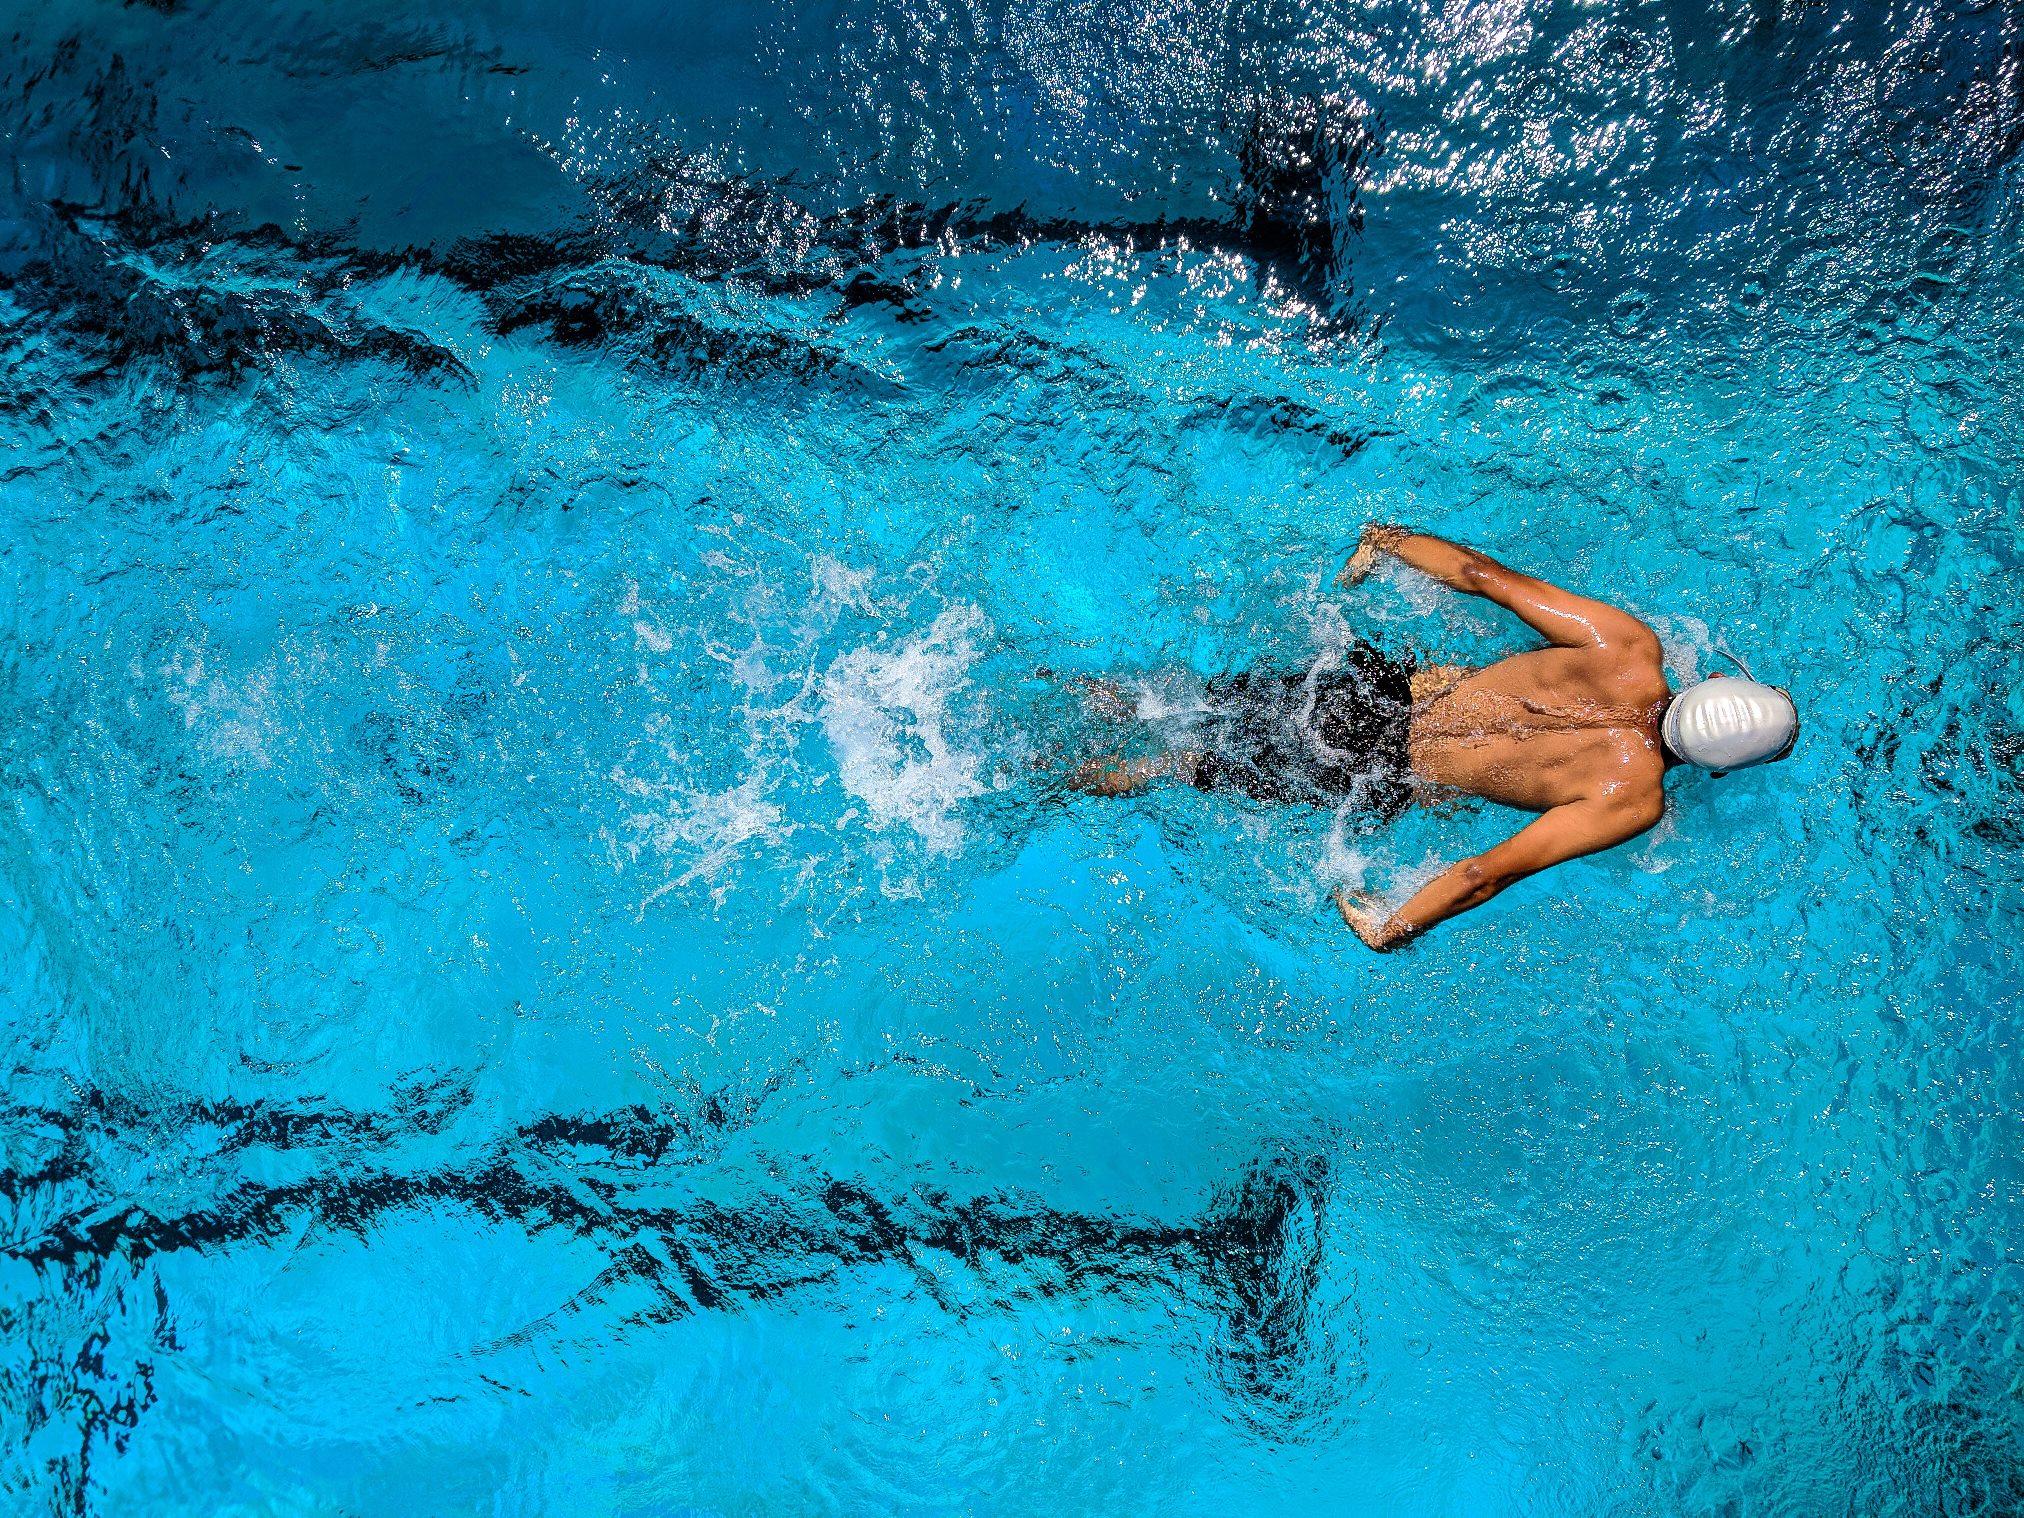 sejour-adapte-natation